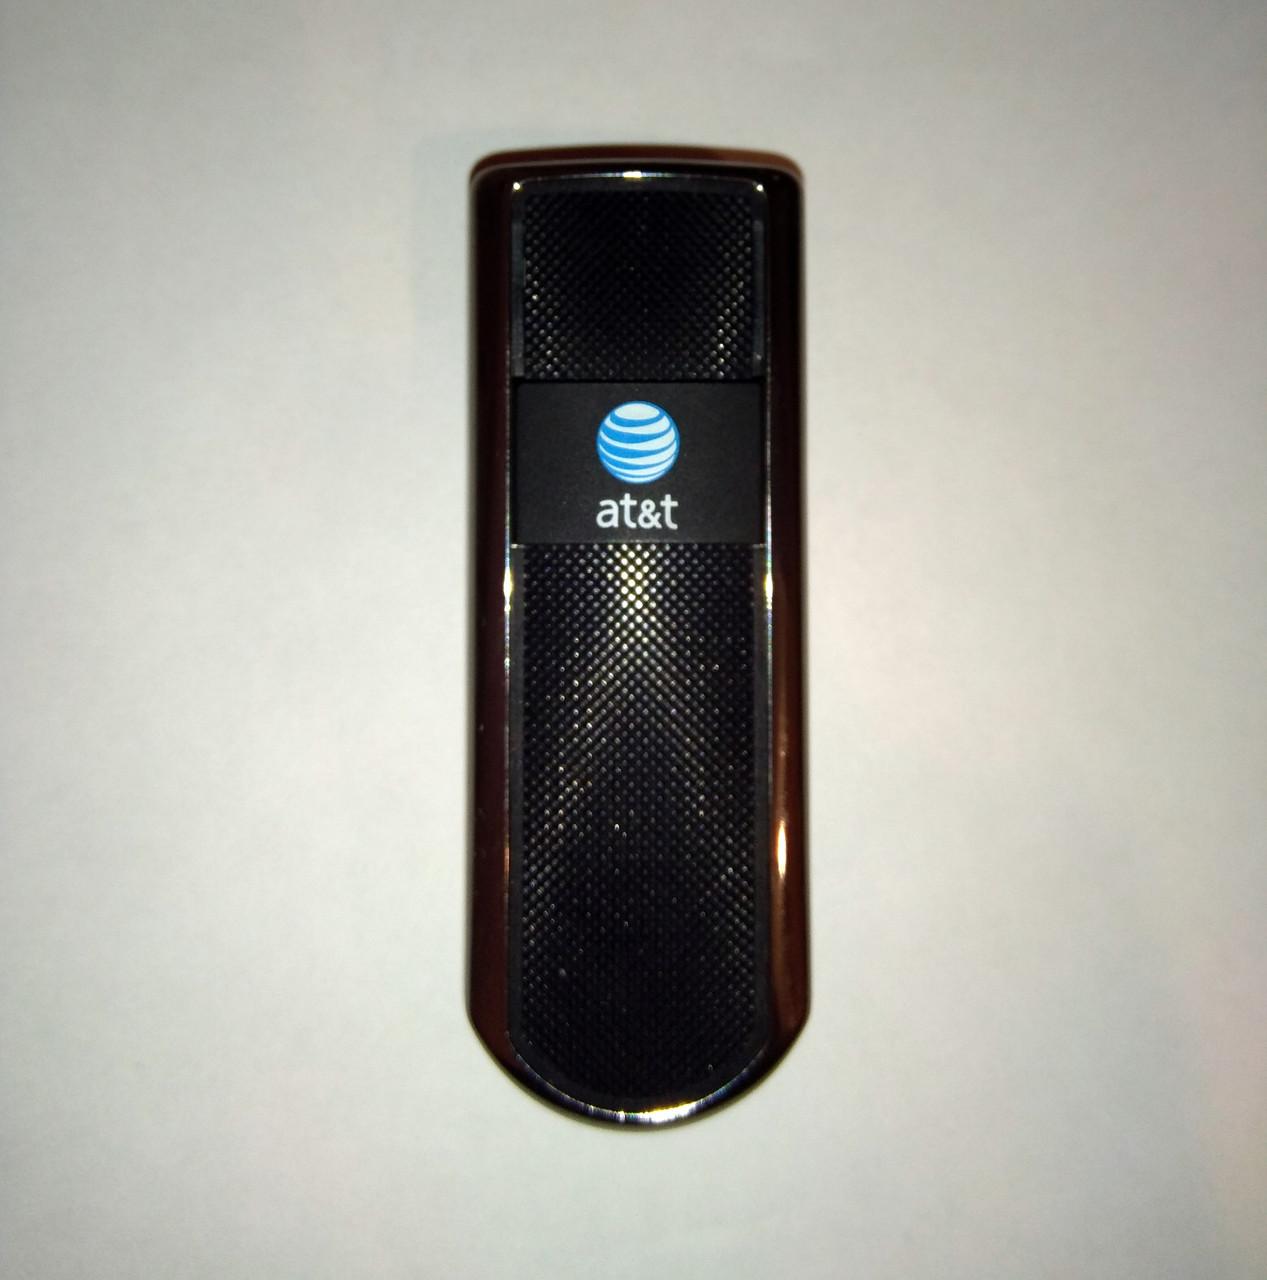 Модем 3G Option GI0460 для Киевстар, Vodafone, Lifecell